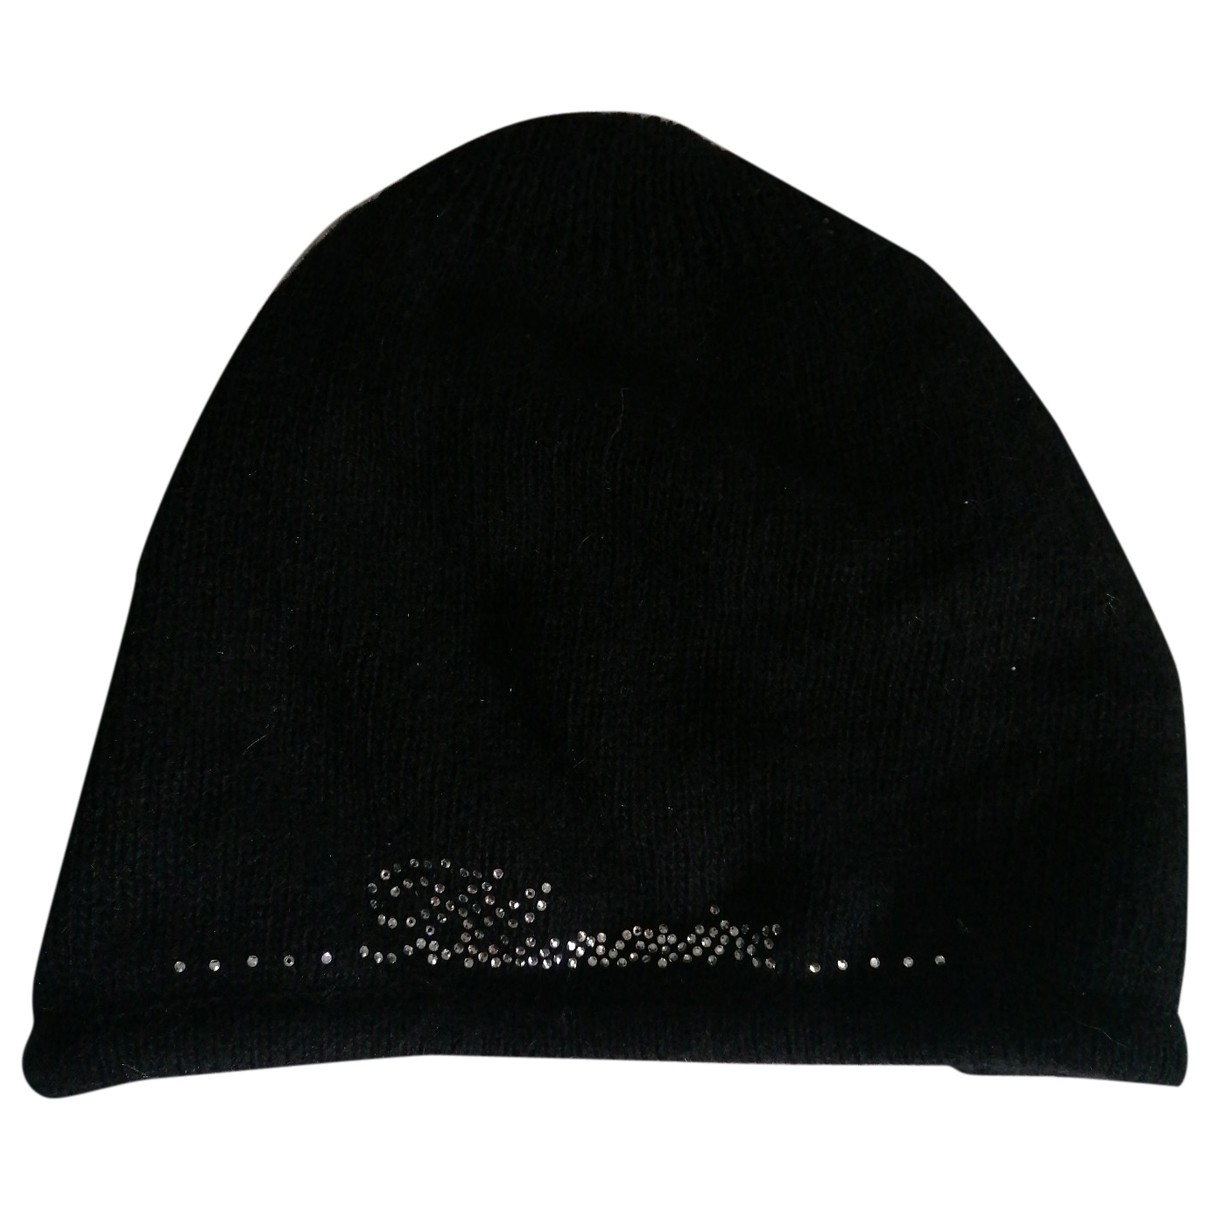 Blumarine \N Black Wool hat for Women M International